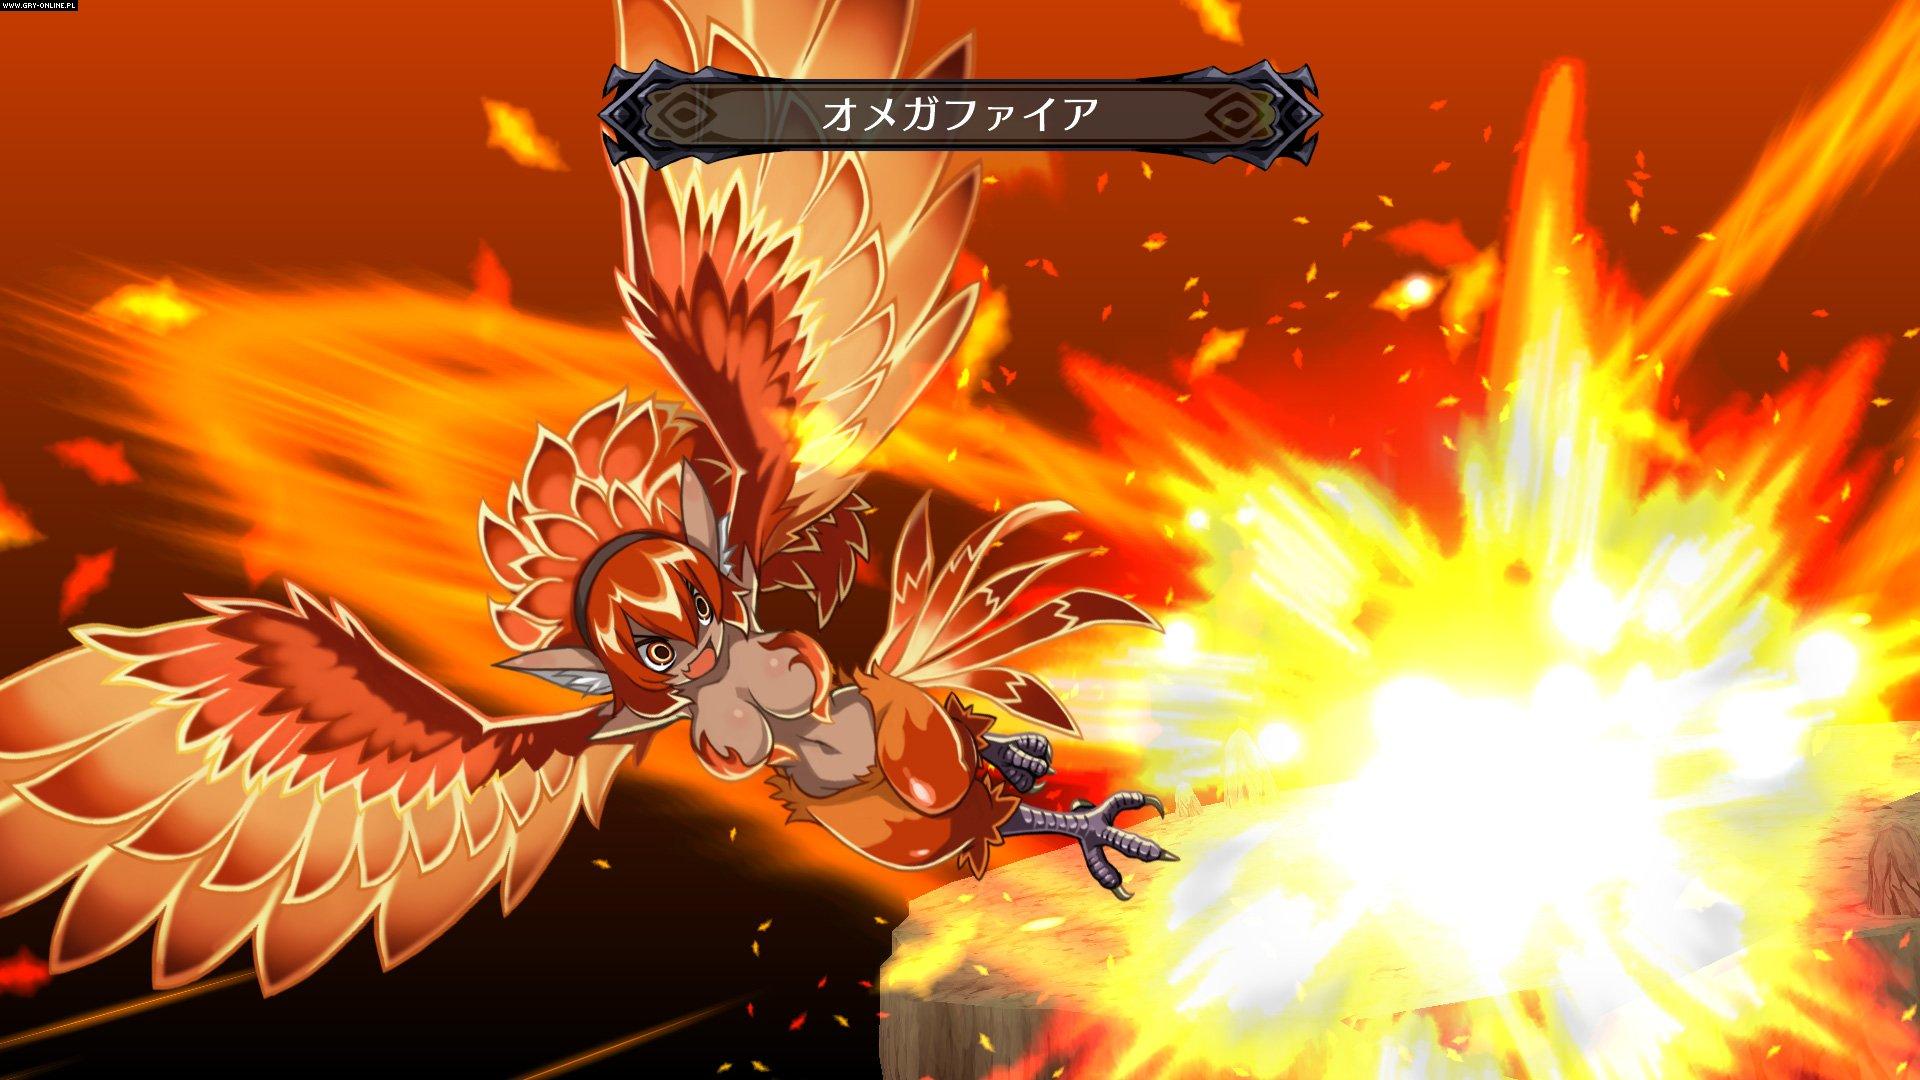 Disgaea 5: Alliance of Vengeance PS4, Switch Games Image 13/40, Nippon Ichi Soft., NIS America